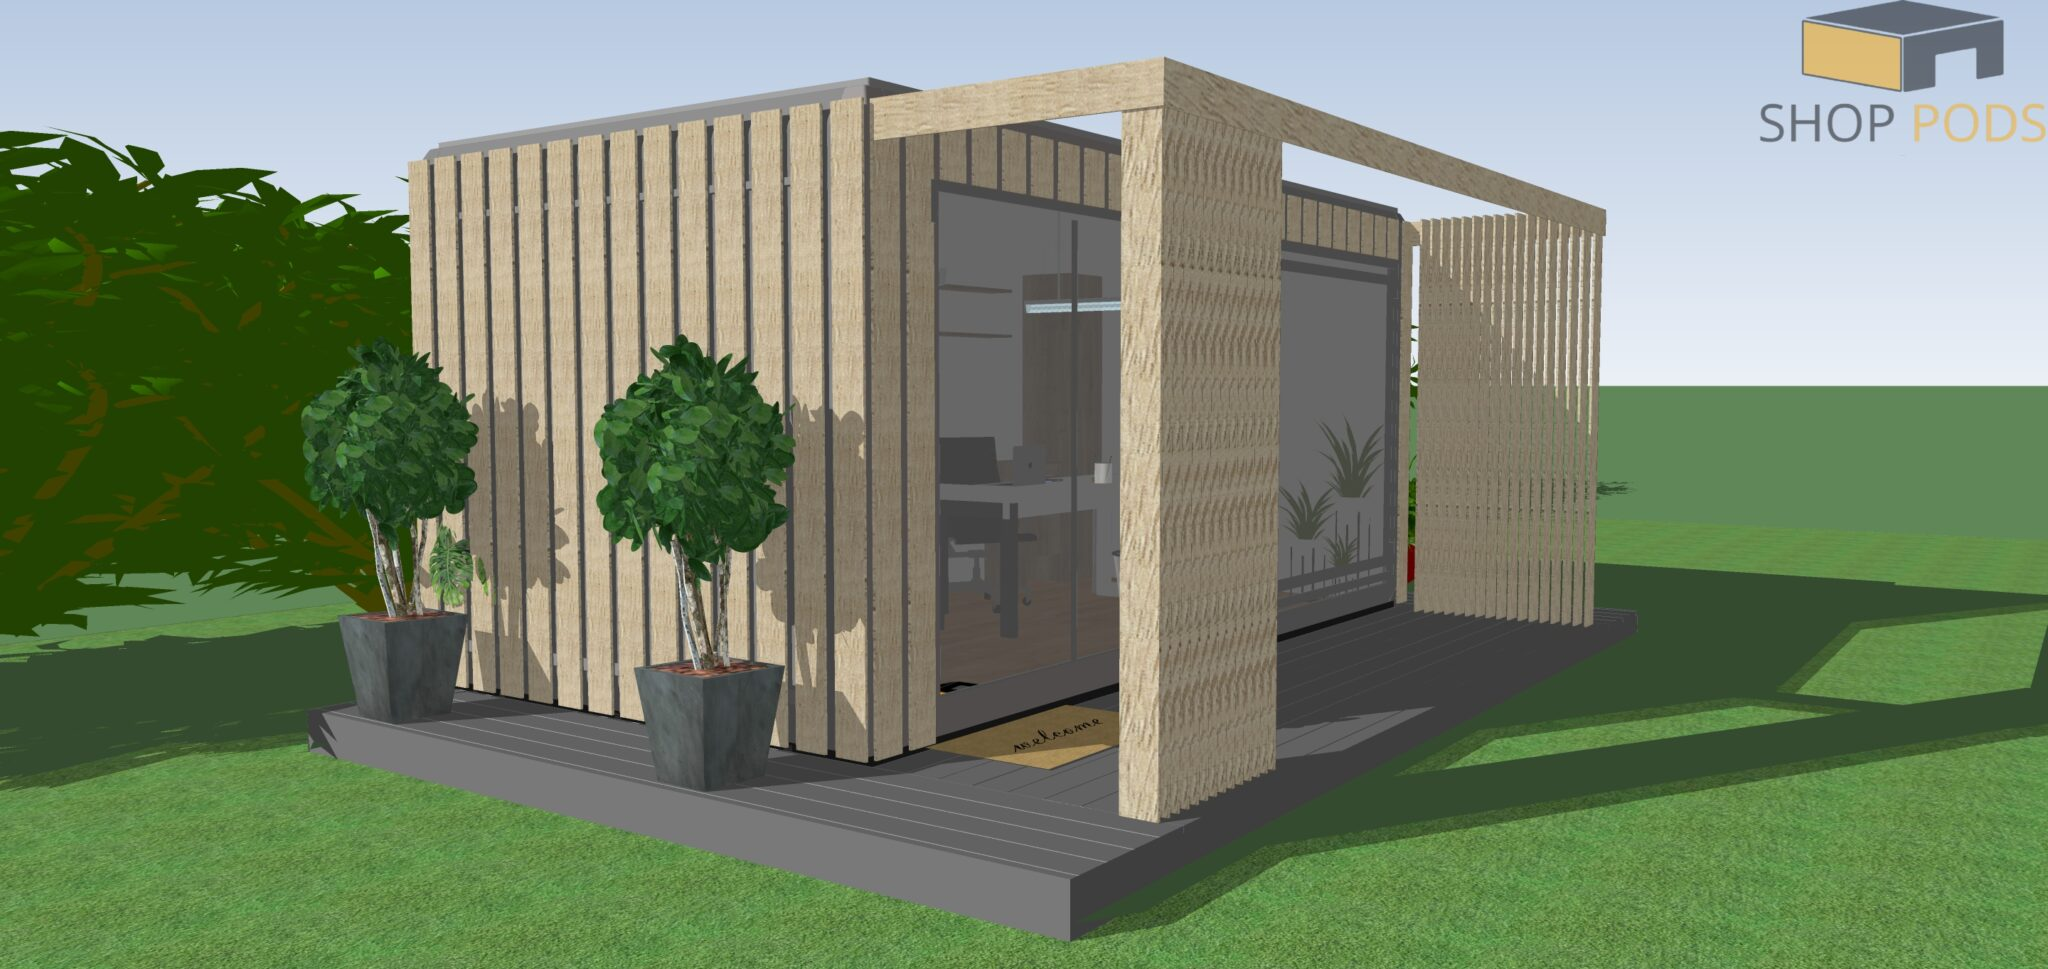 5.1m x 2.7m- Garden Office